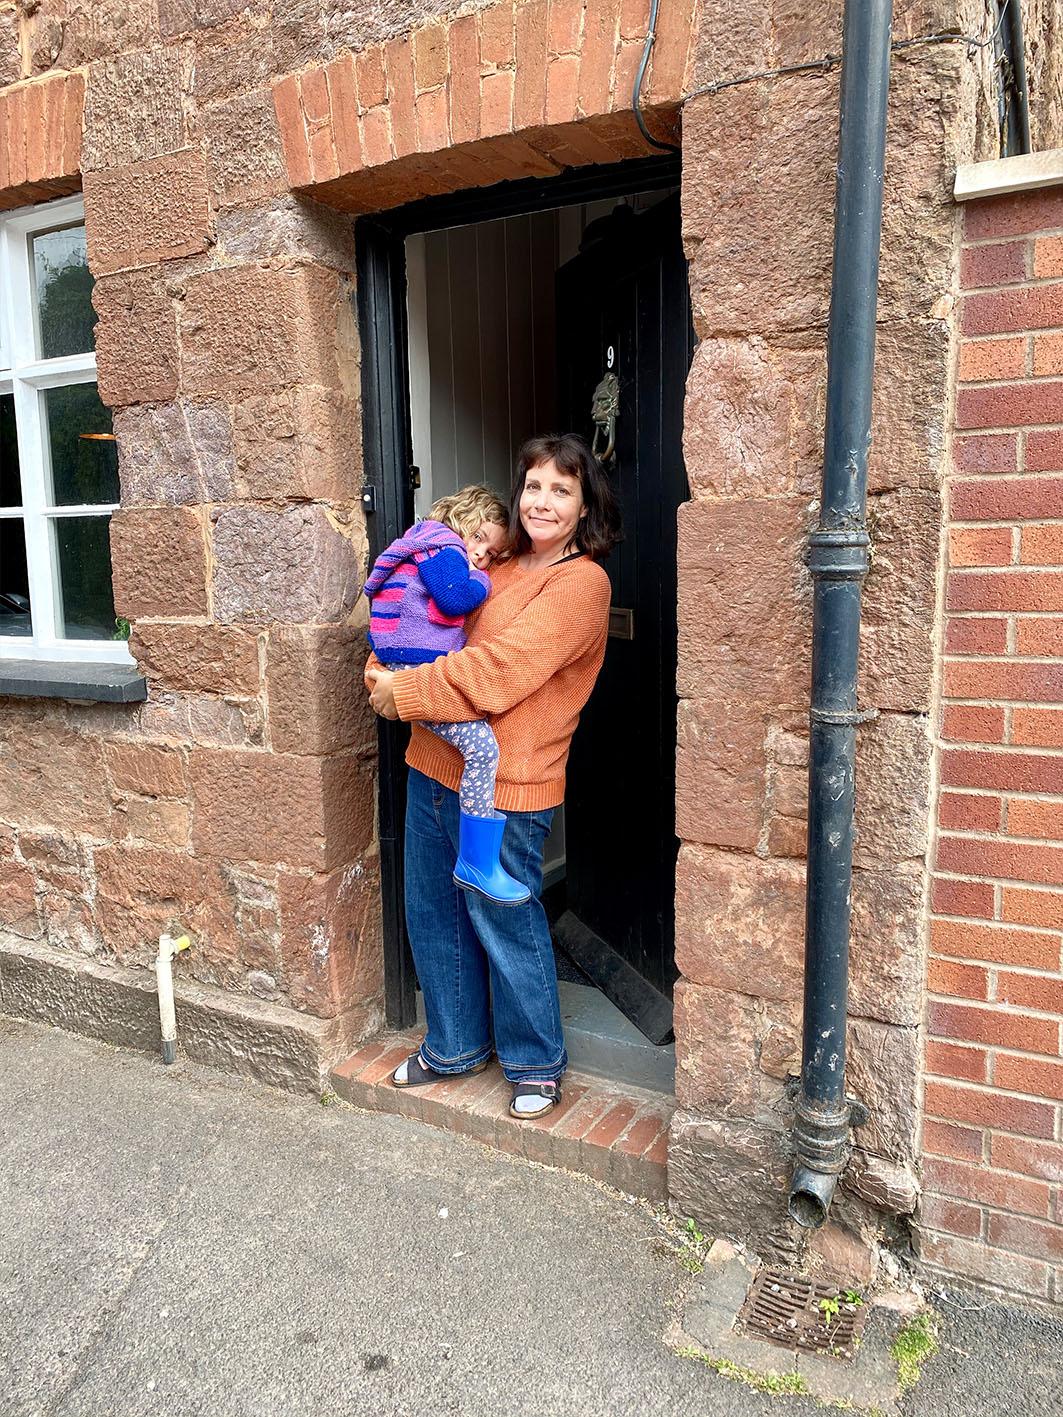 Exeter doorstep photography merissa and tala exploring exeter